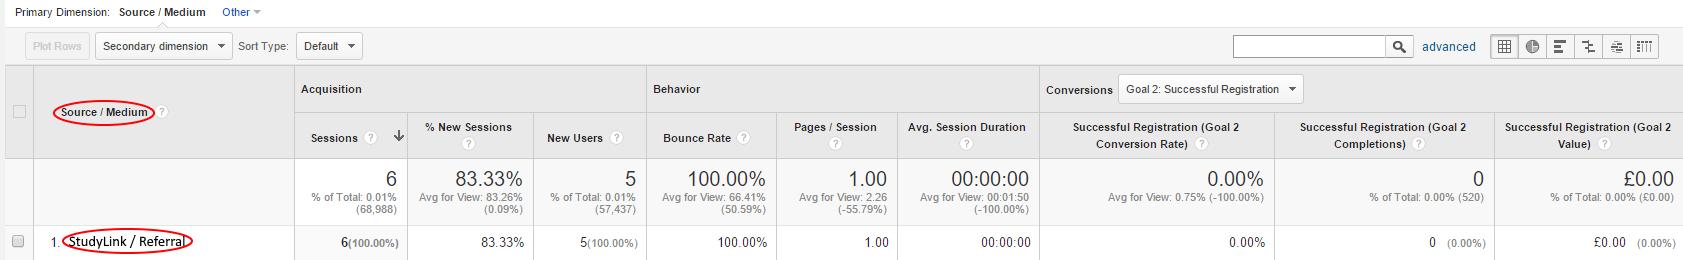 StudyLink/Referral in Google Analytics